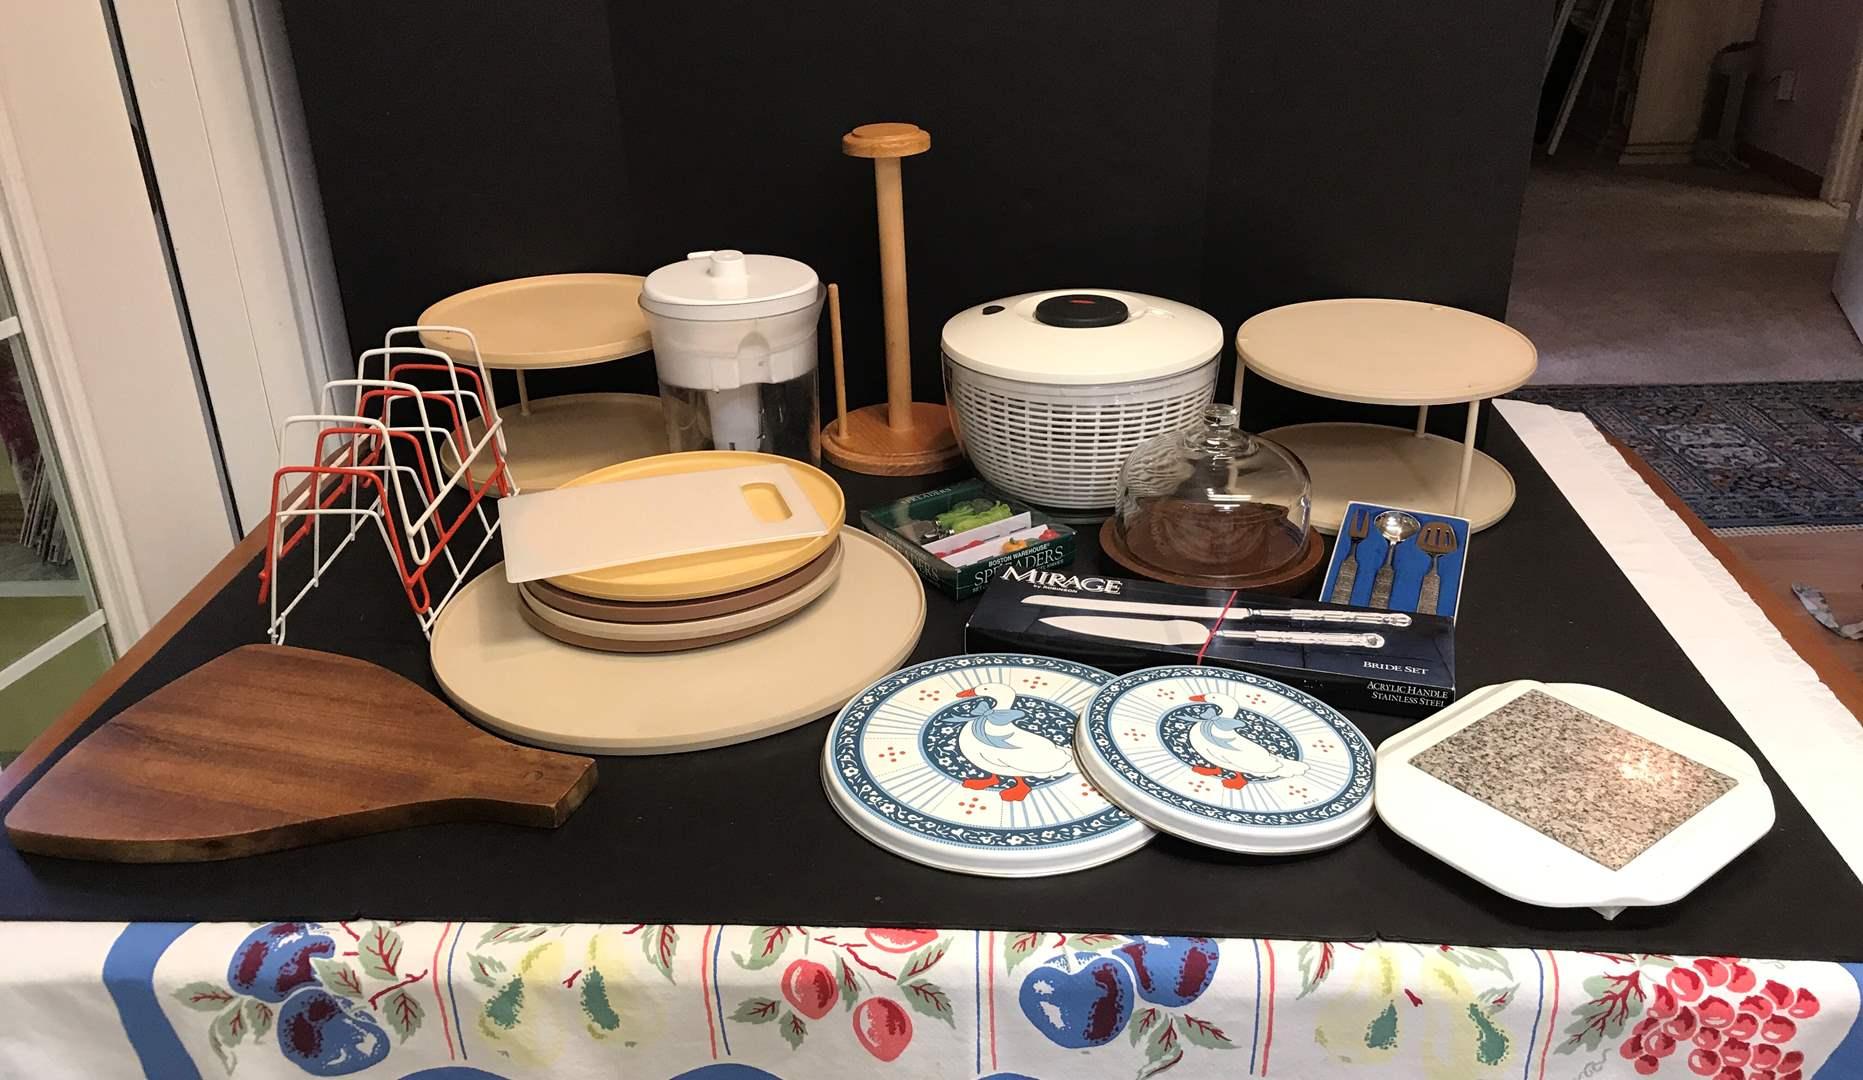 Lot # 72 - Lot of Lazy Susan's, Salad Spinner, Plate Racks & More (main image)